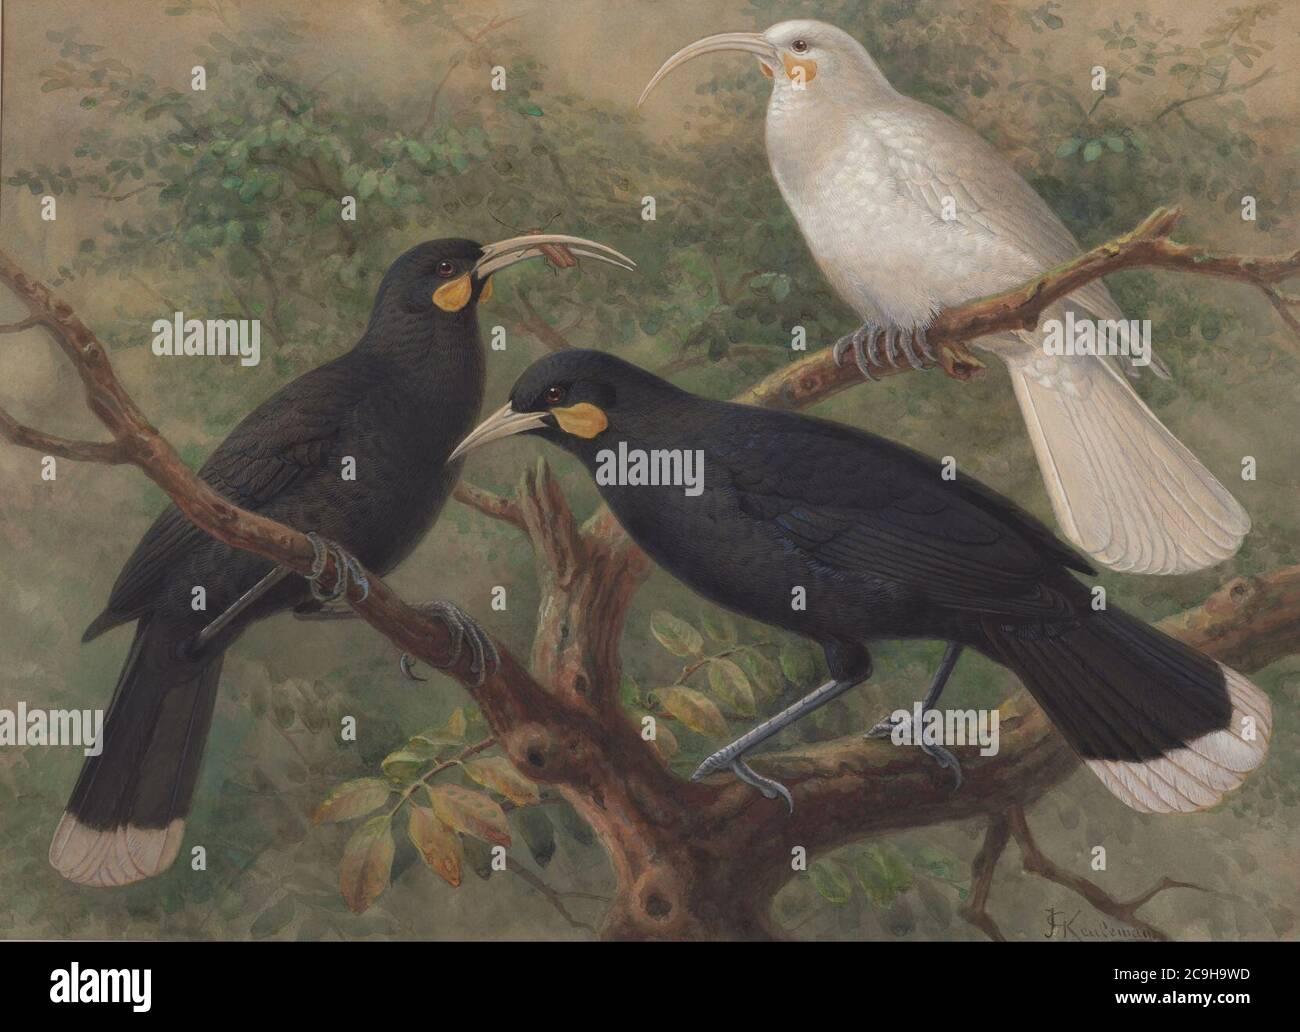 J. G. Keulemans - Three Huia (Heteralocha acutirostris) Stock Photo